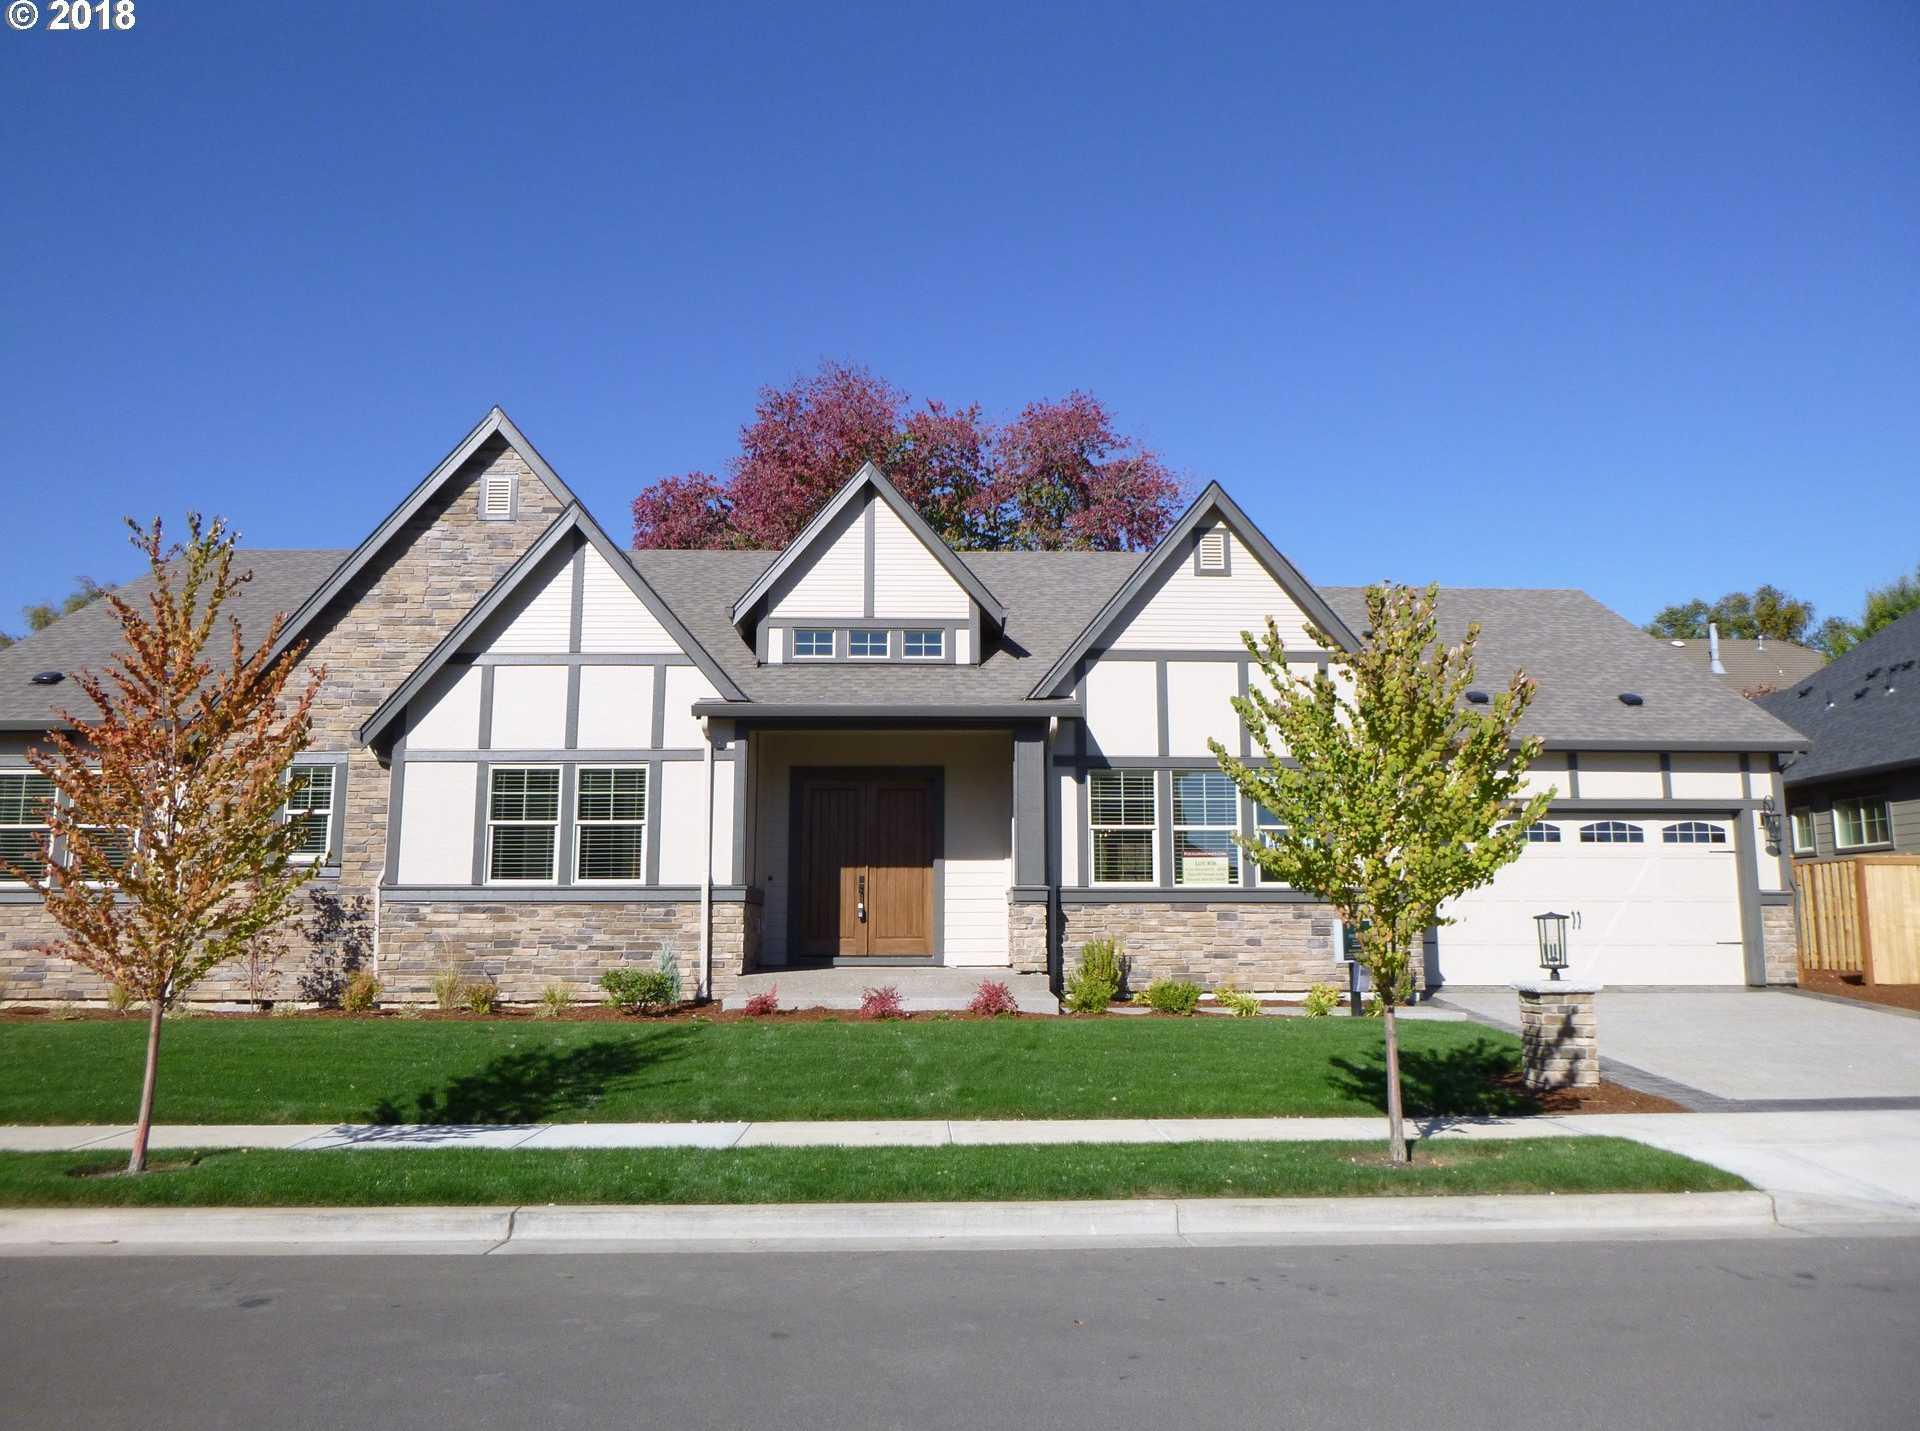 $909,990 - 3Br/3Ba -  for Sale in River Terrace Estates, Tigard